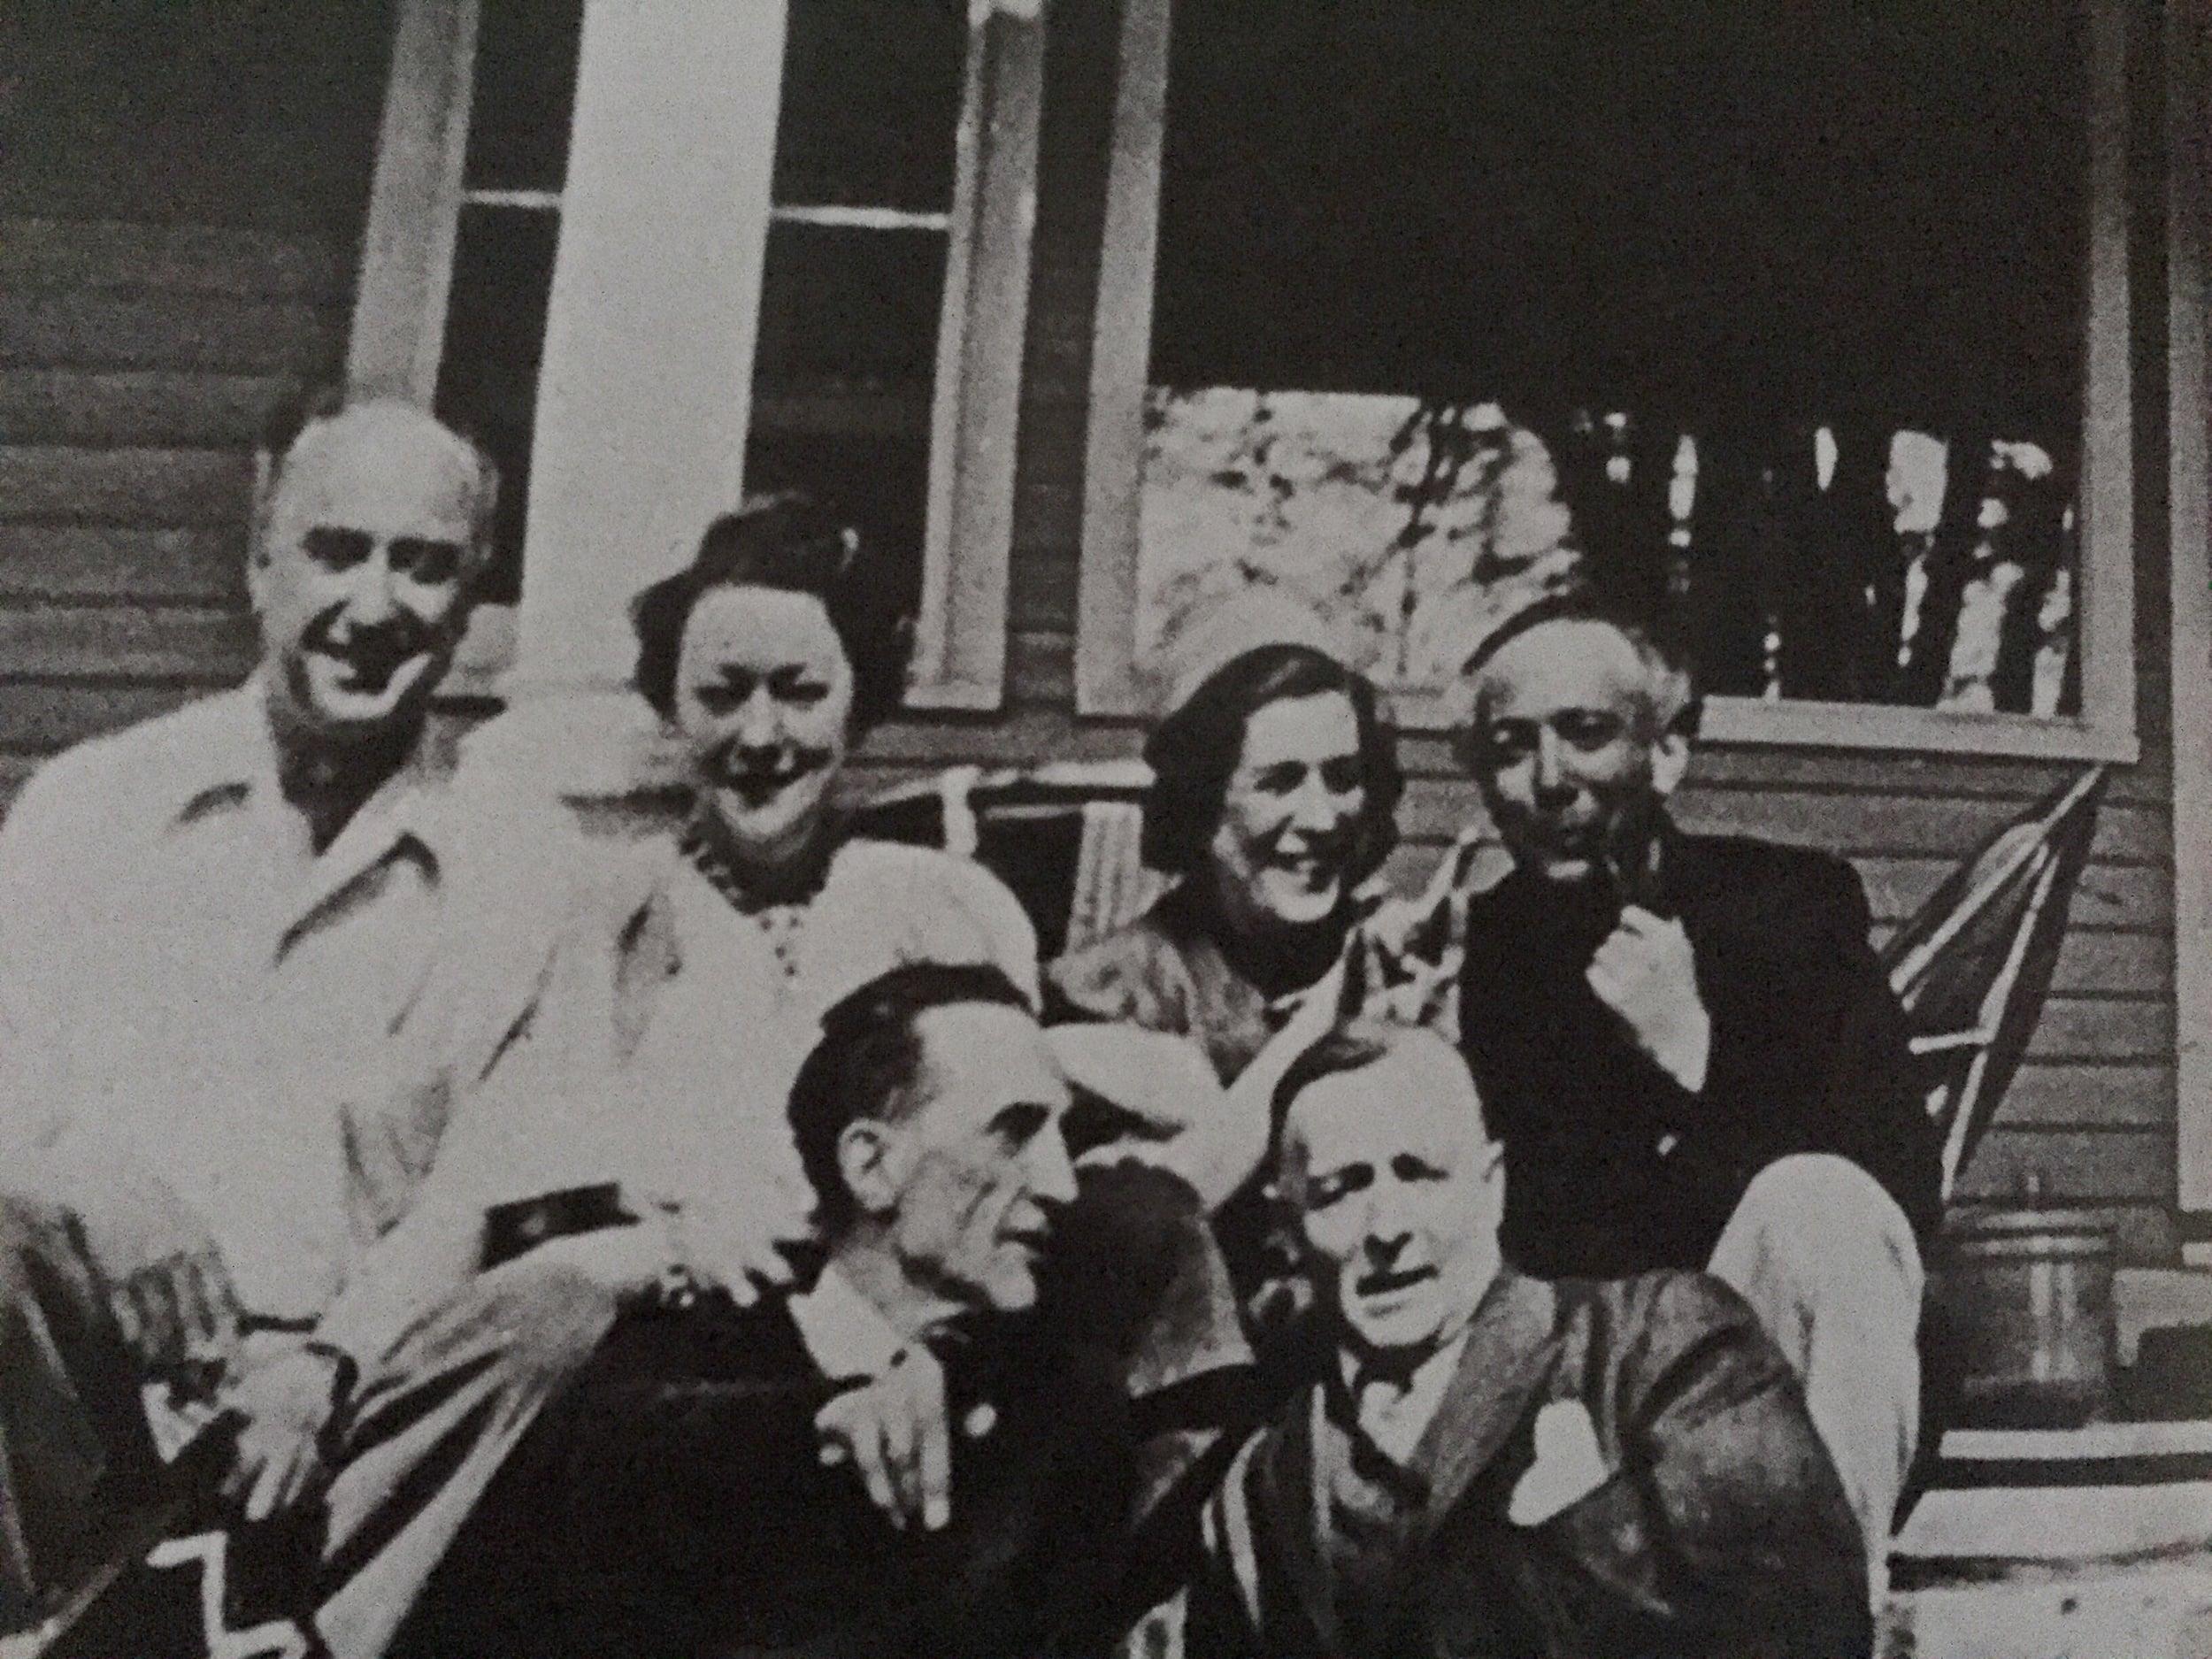 Back row: Yves Tanguy, Kay Sage, Maria Martins, Enrico Donati;front row: Marcel Duchamp, Frederick Kiesler. Photograph taken in Woodbury, CT, 23 April 1943. Courtesy of Stephen Miller.